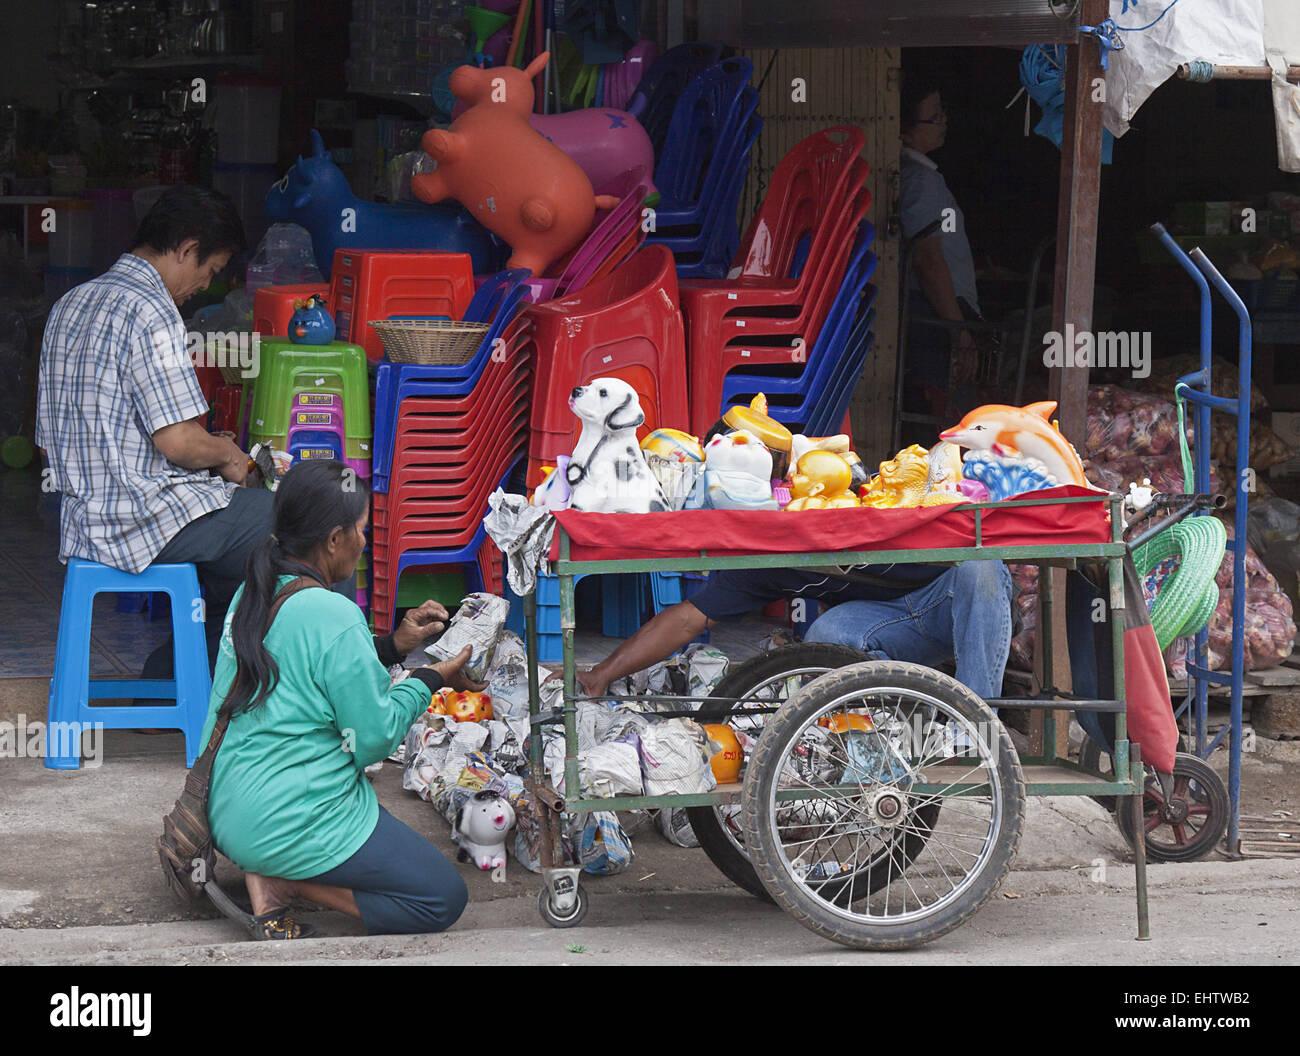 Toy sale - Stock Image